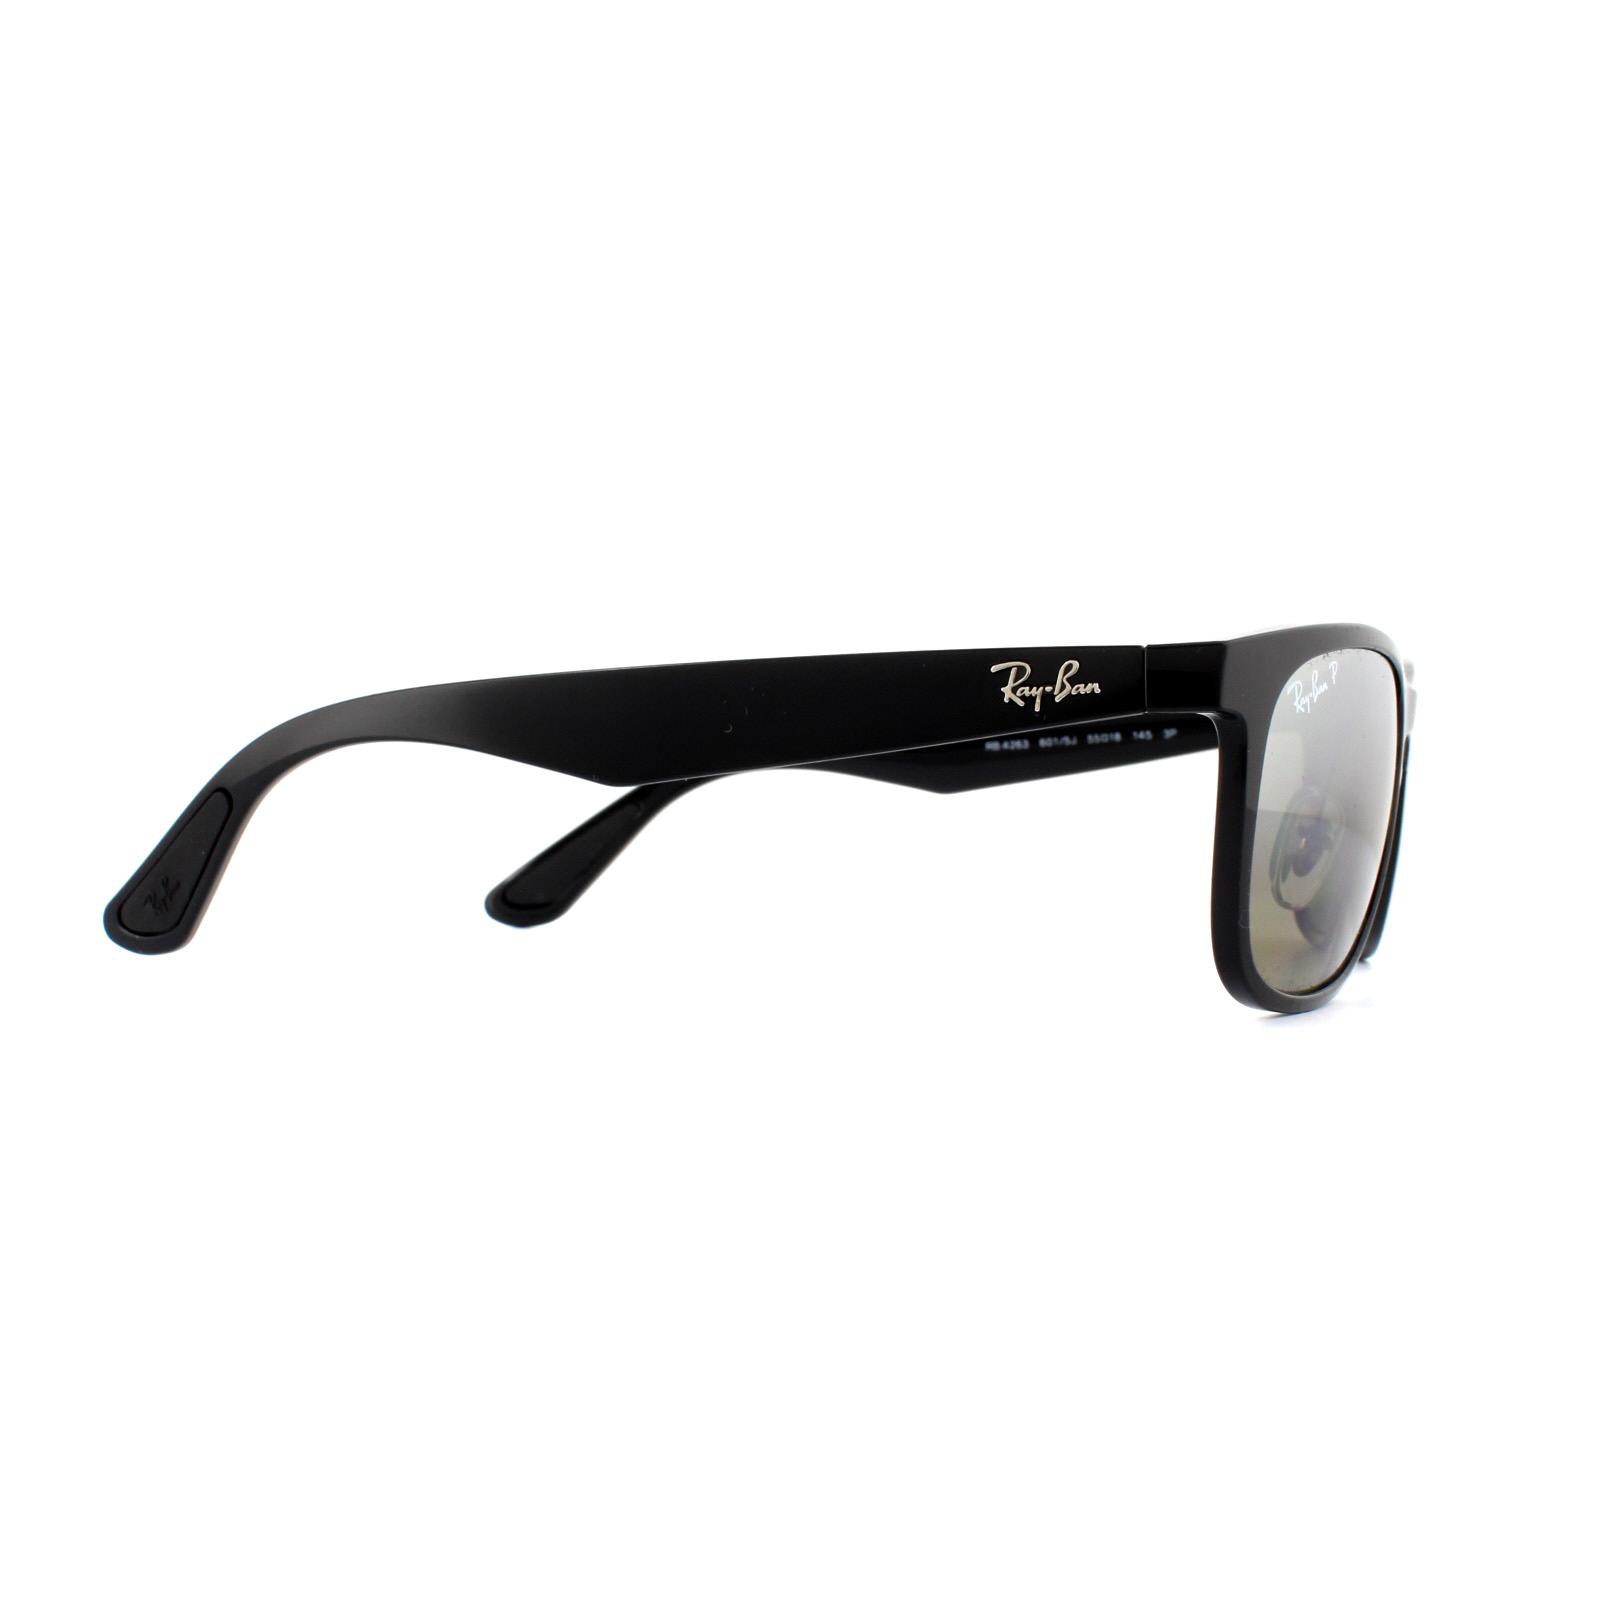 01a660b1b22 Sentinel Ray-Ban Sunglasses RB4263 601 5J Black Grey Polarized Mirror  Silver Chromance